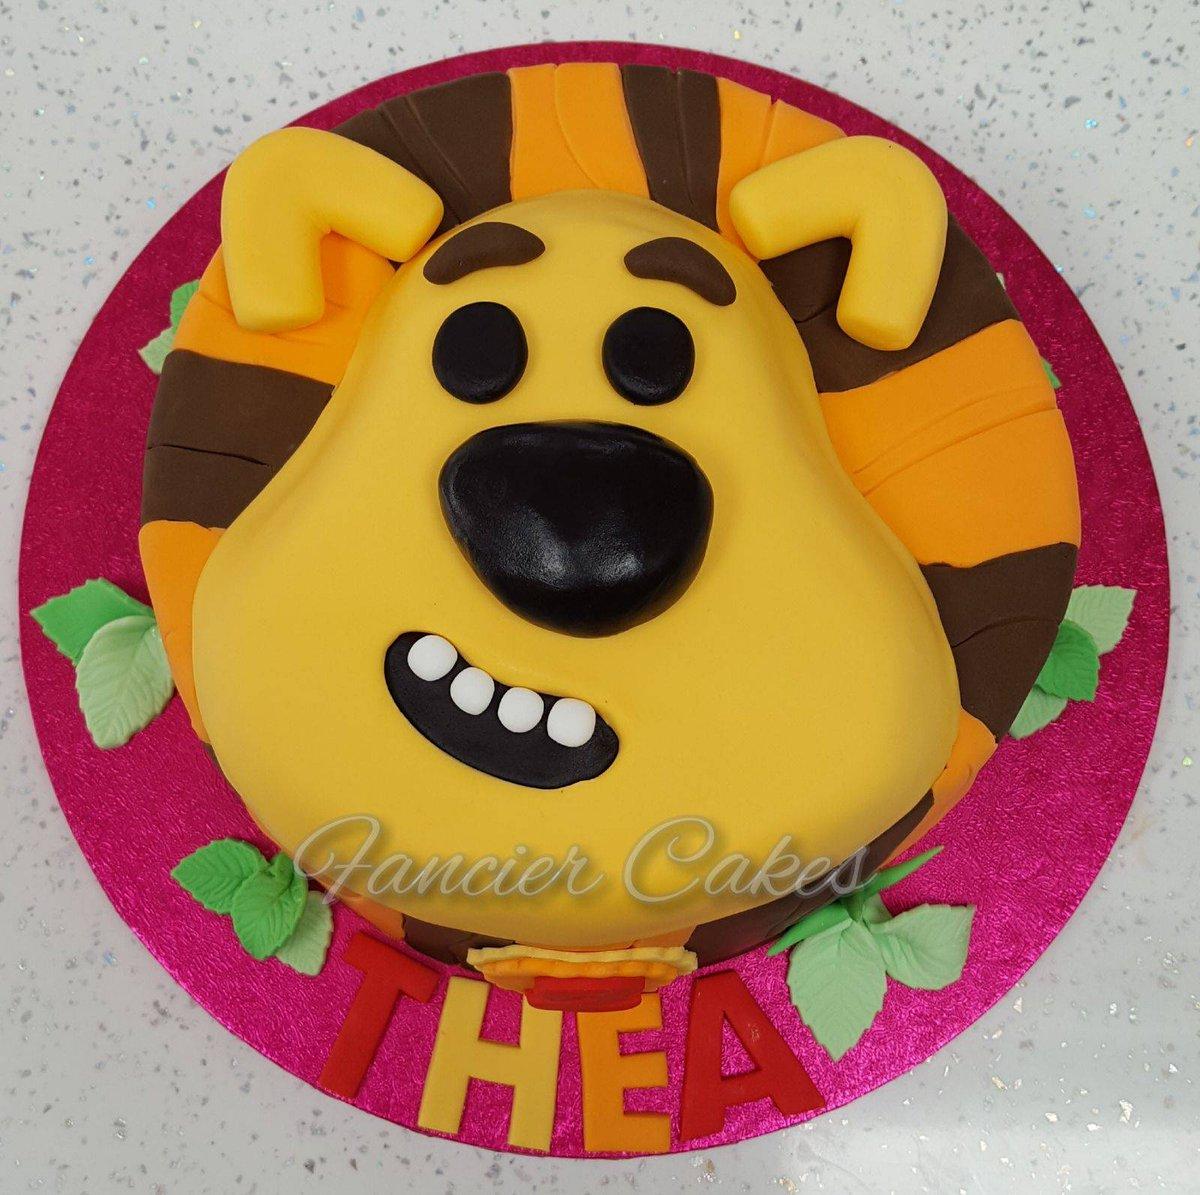 Fancier Cakes On Twitter Raa Raa The Noisy Lion So Cute Cake